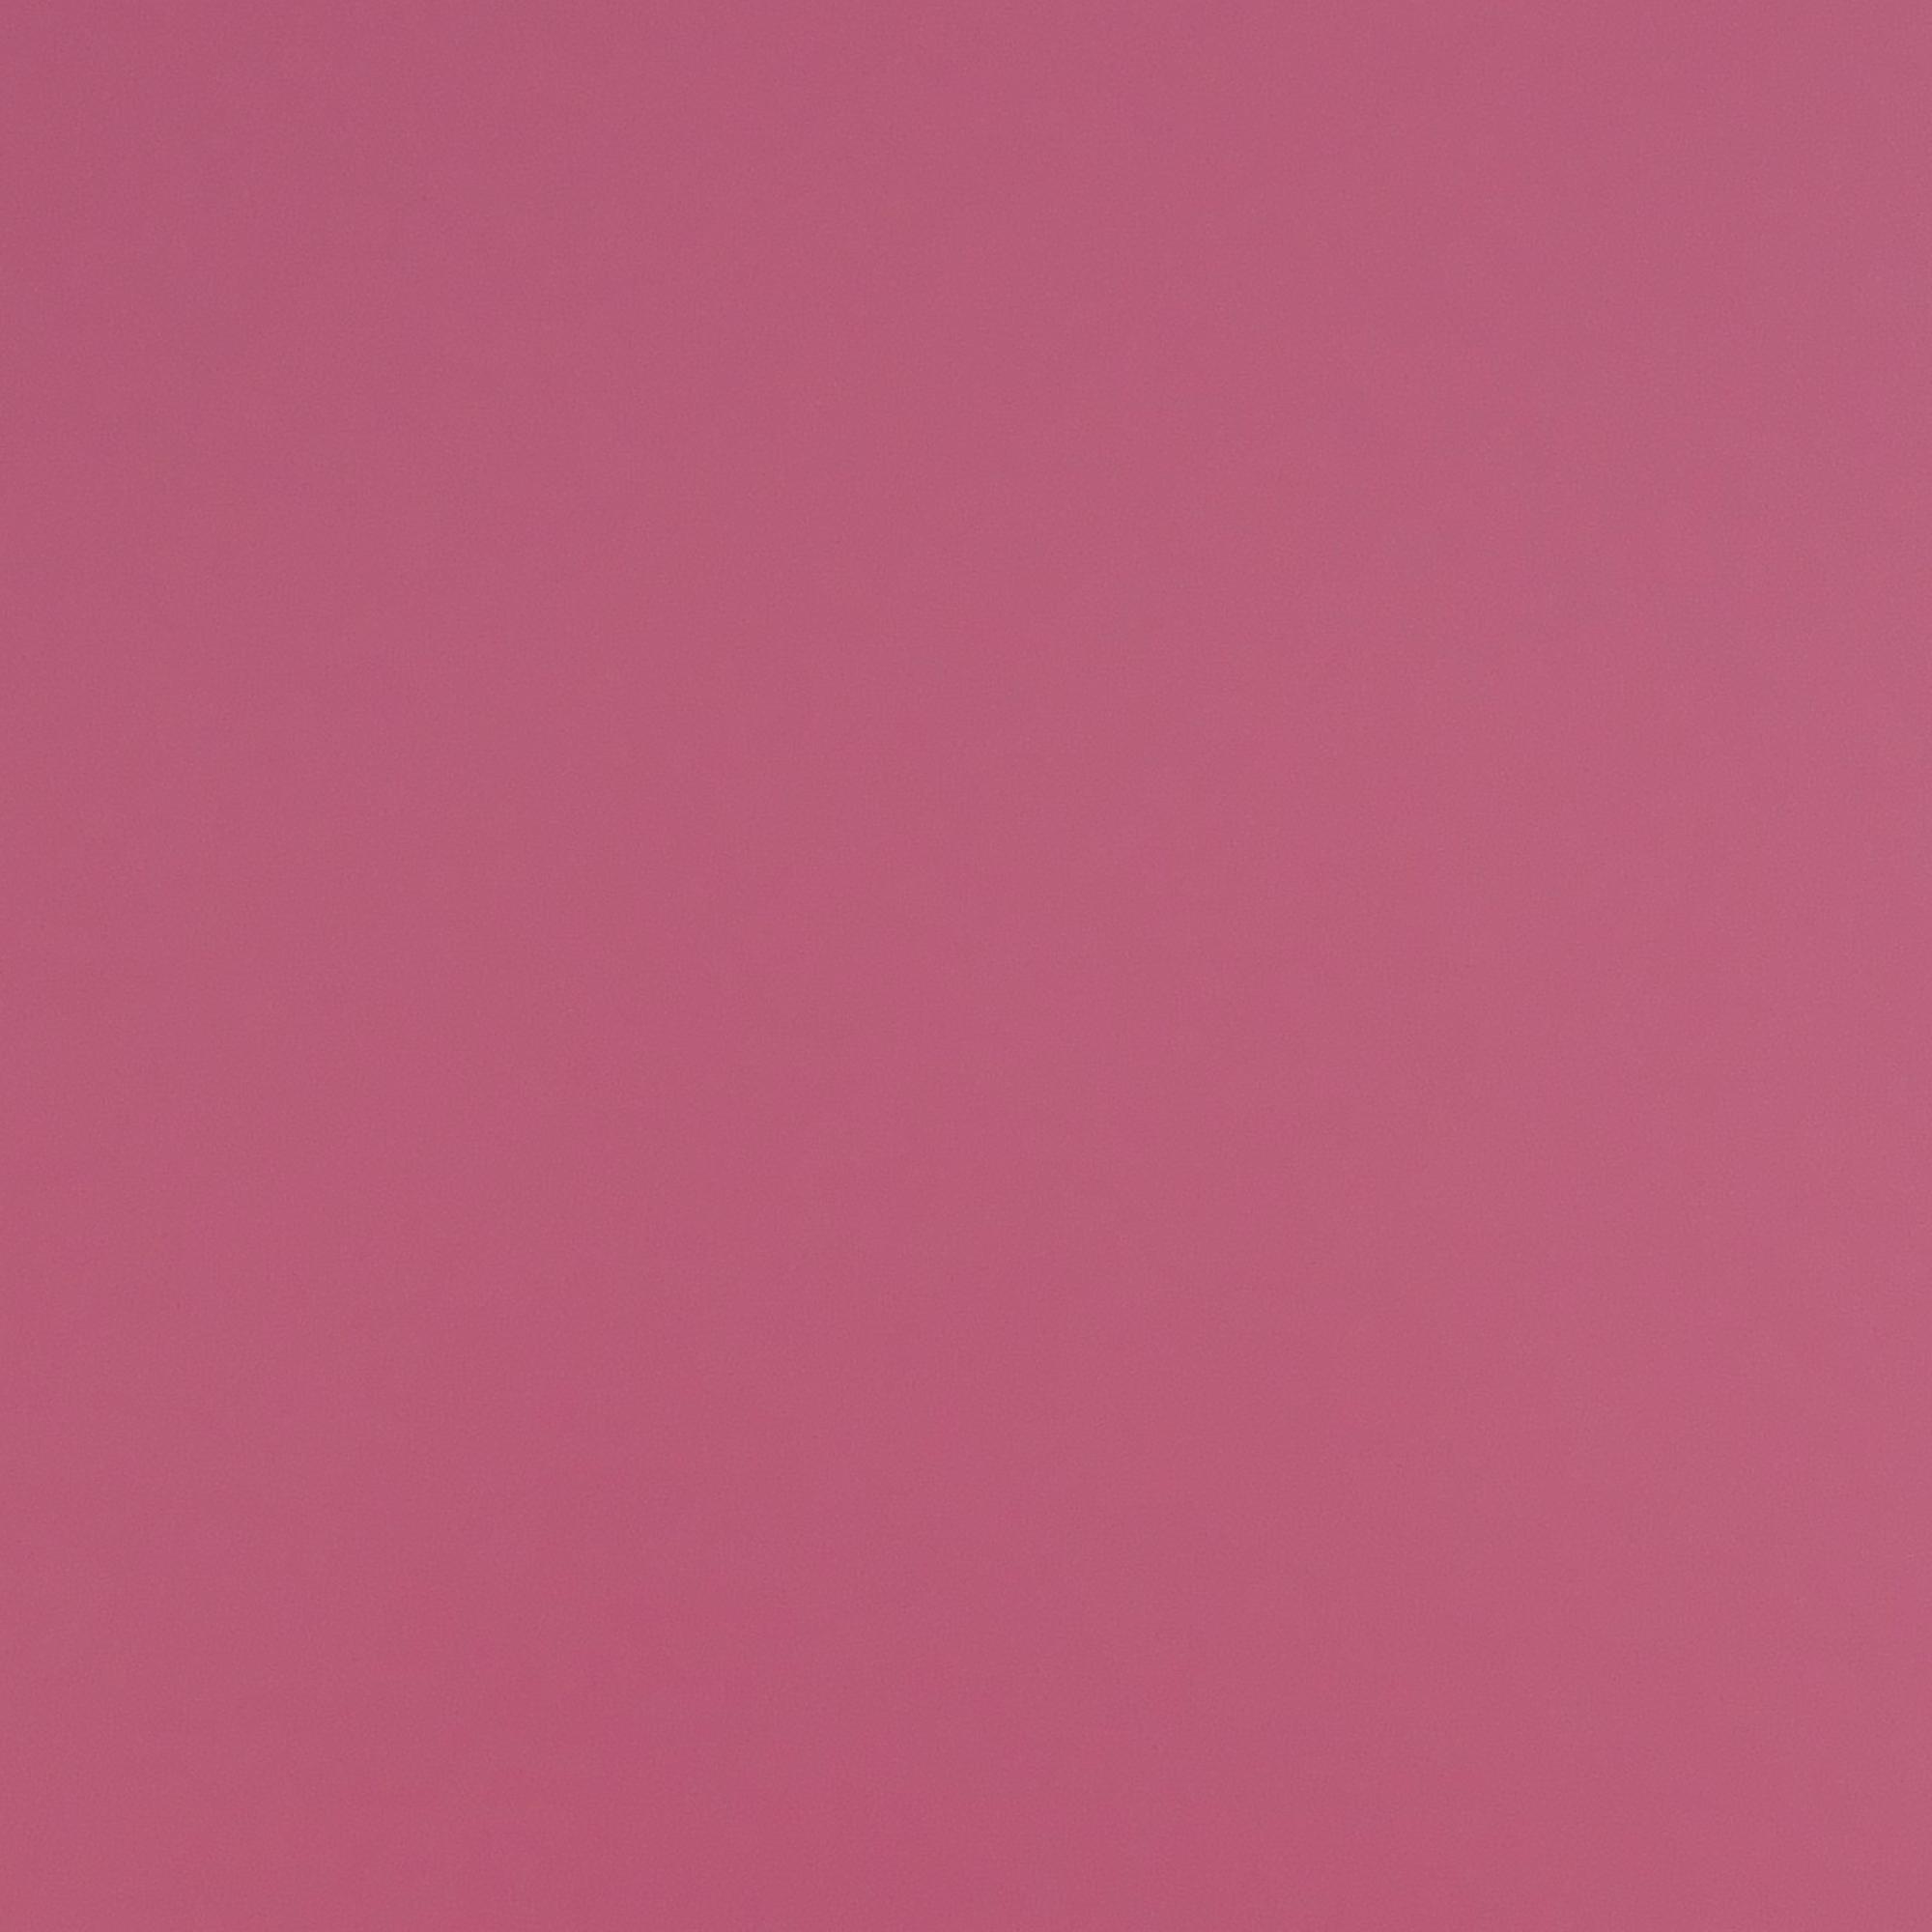 Pink, Paisley